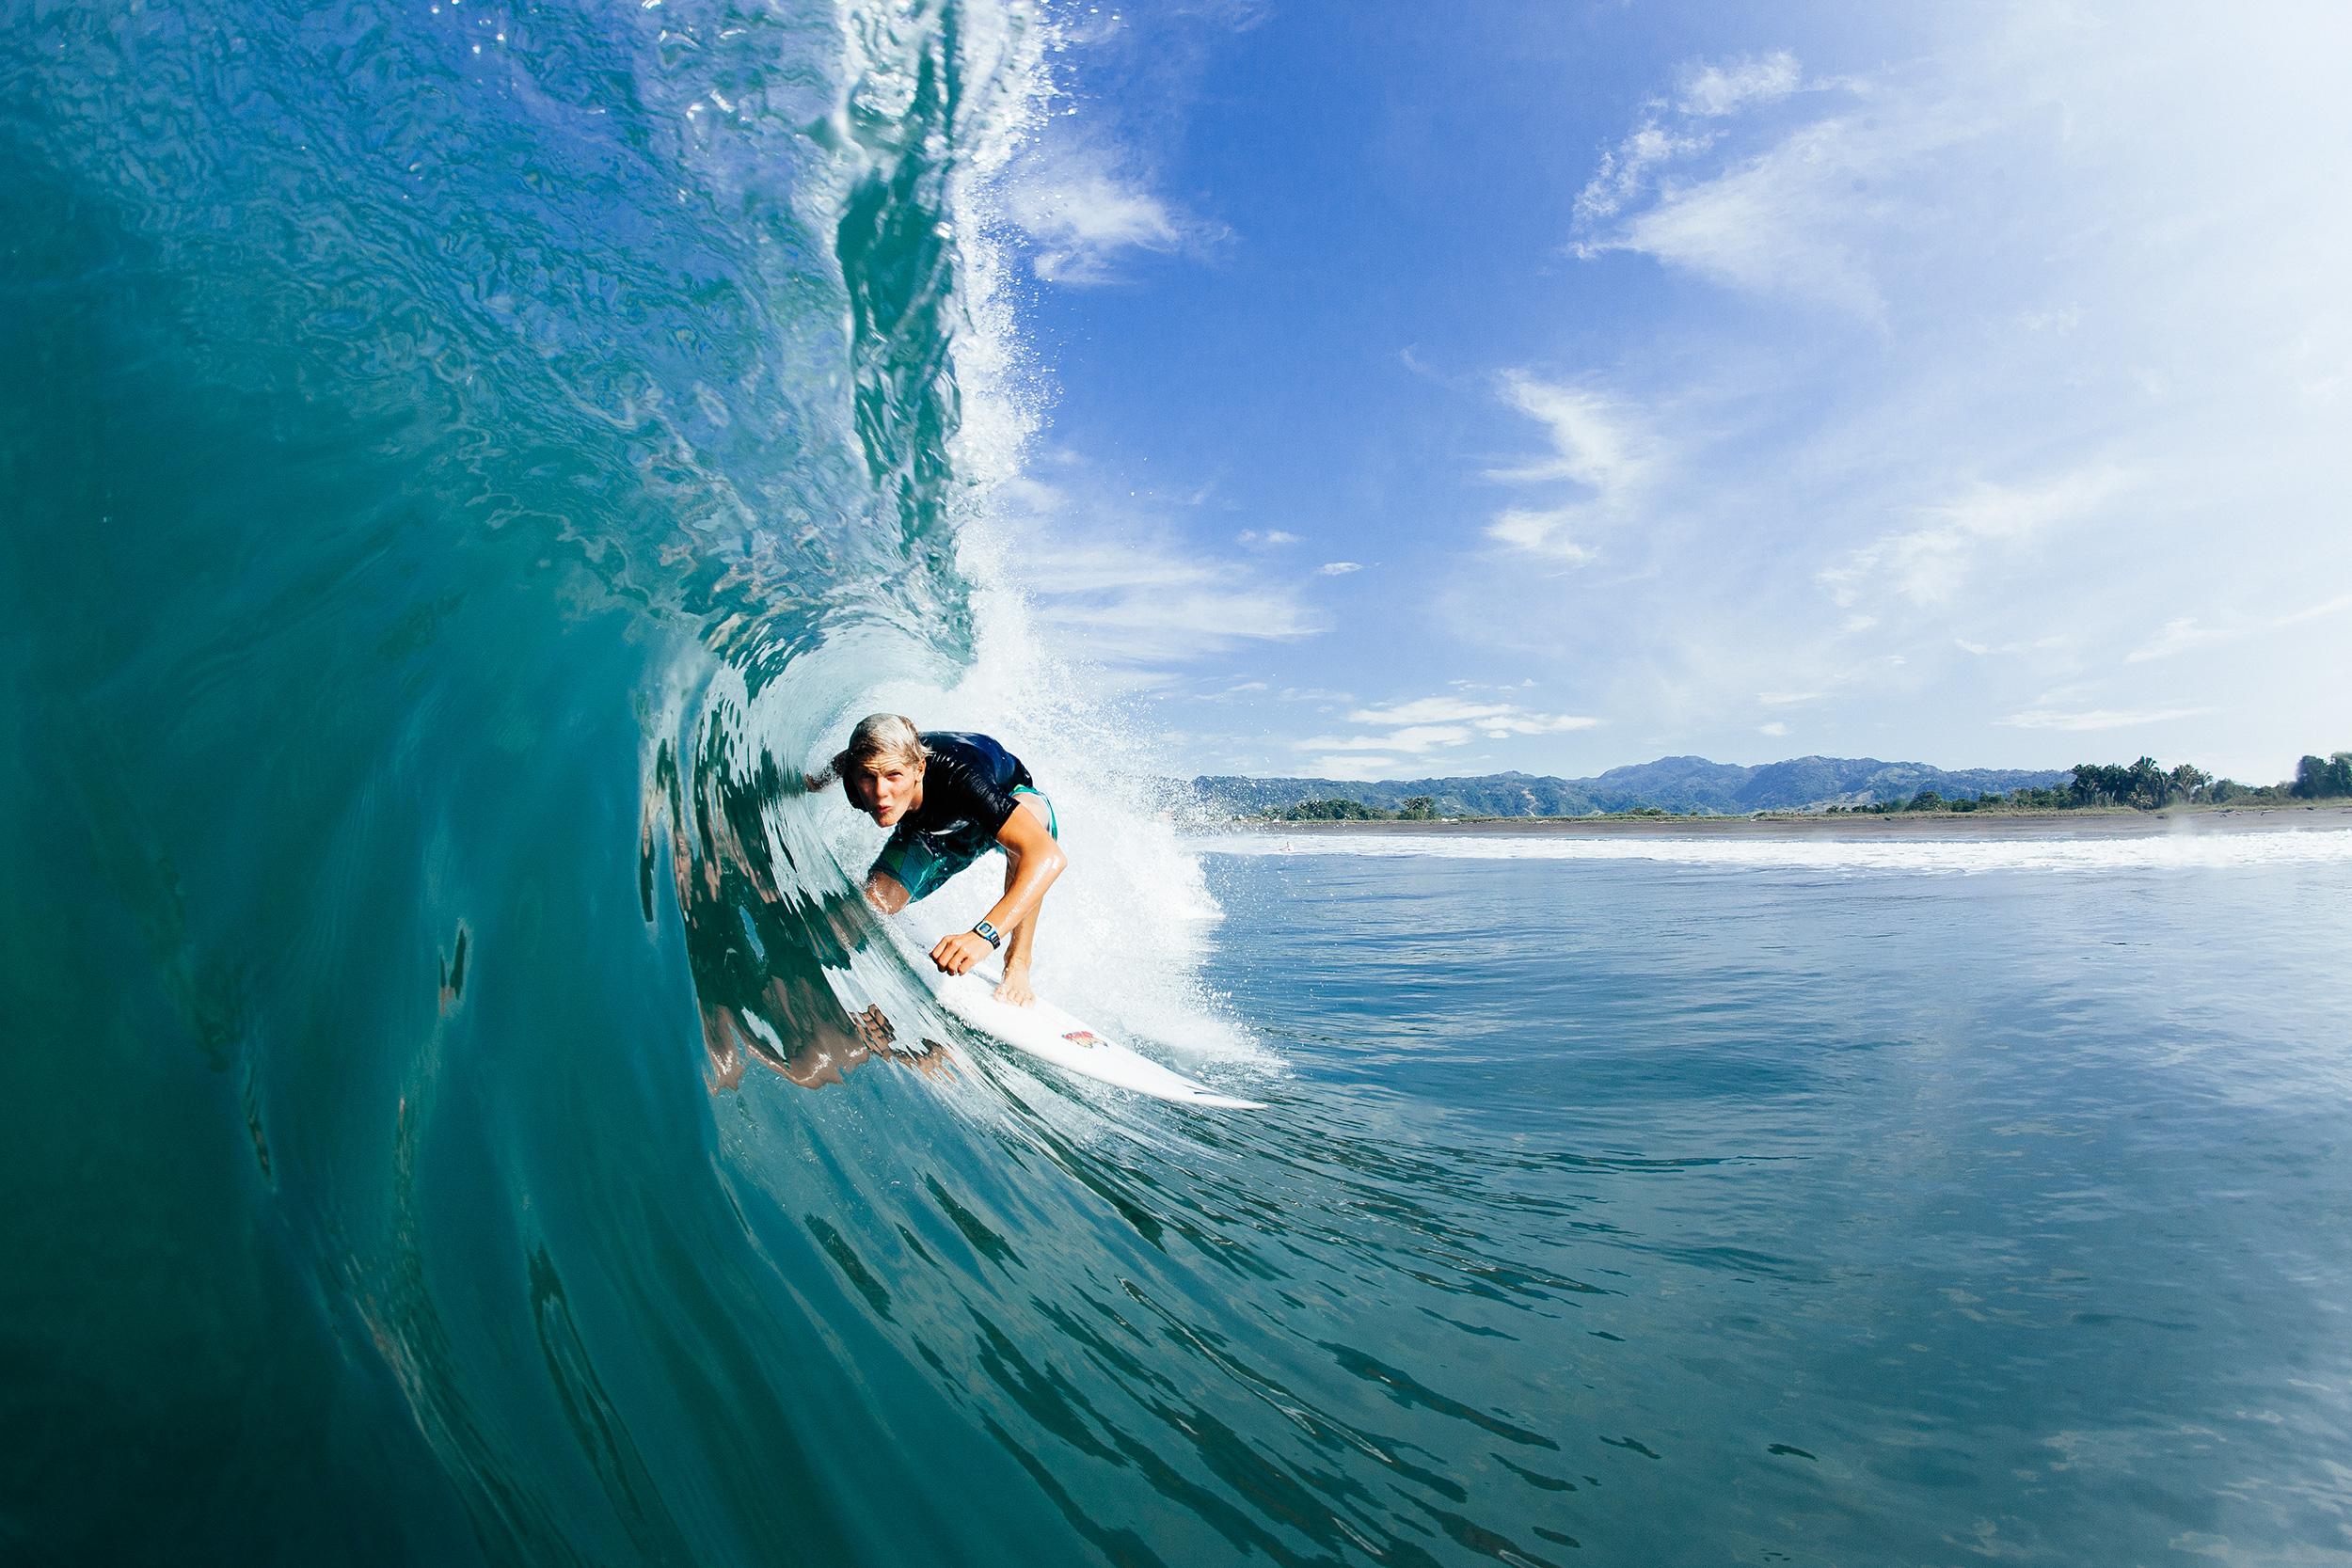 548_surfercostarica.jpg